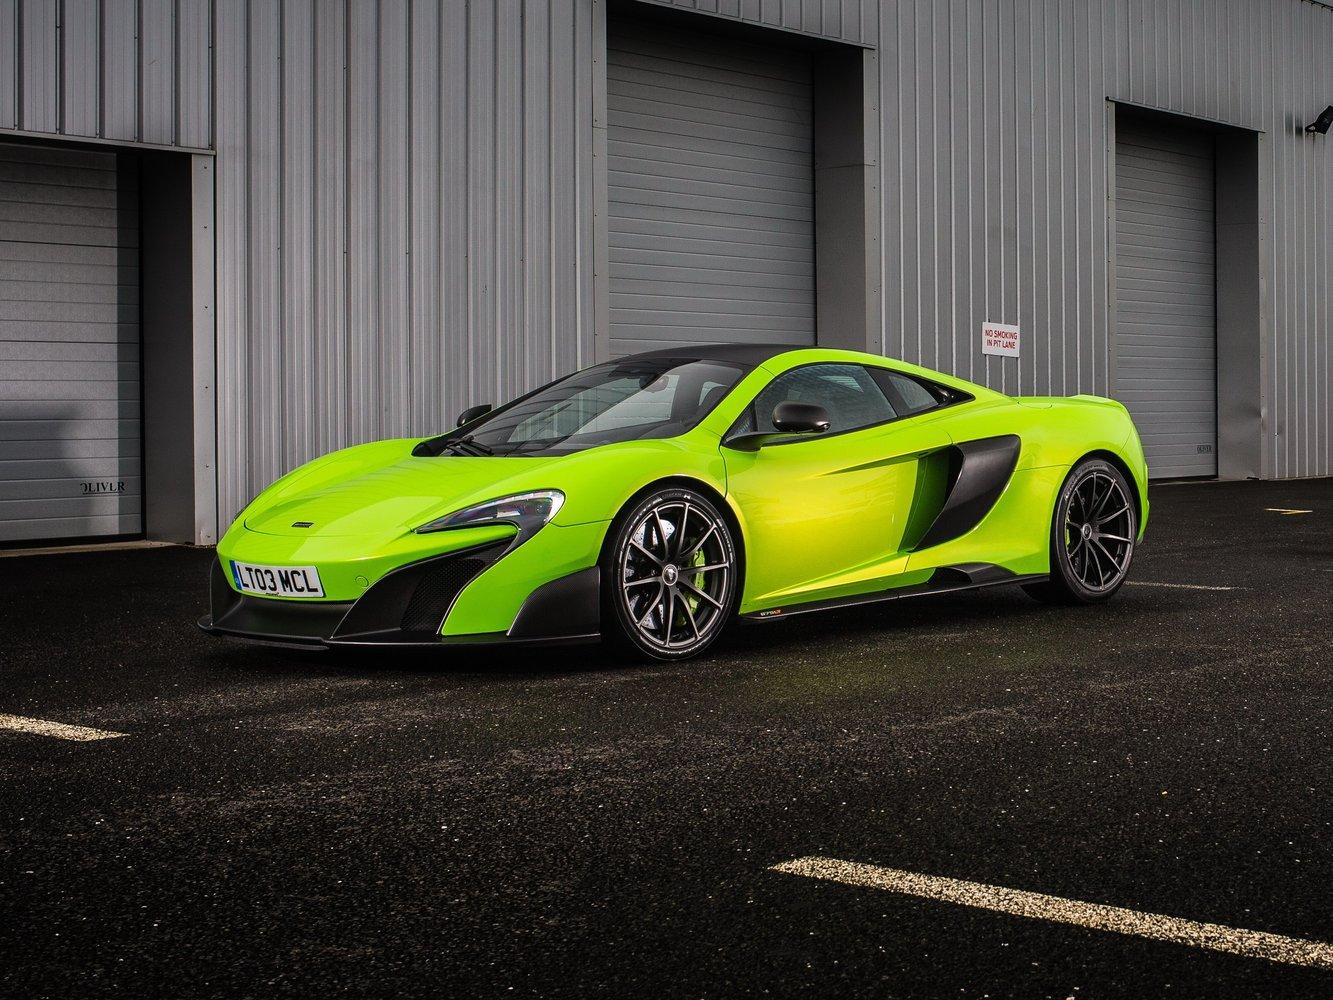 mclaren McLaren 675LT